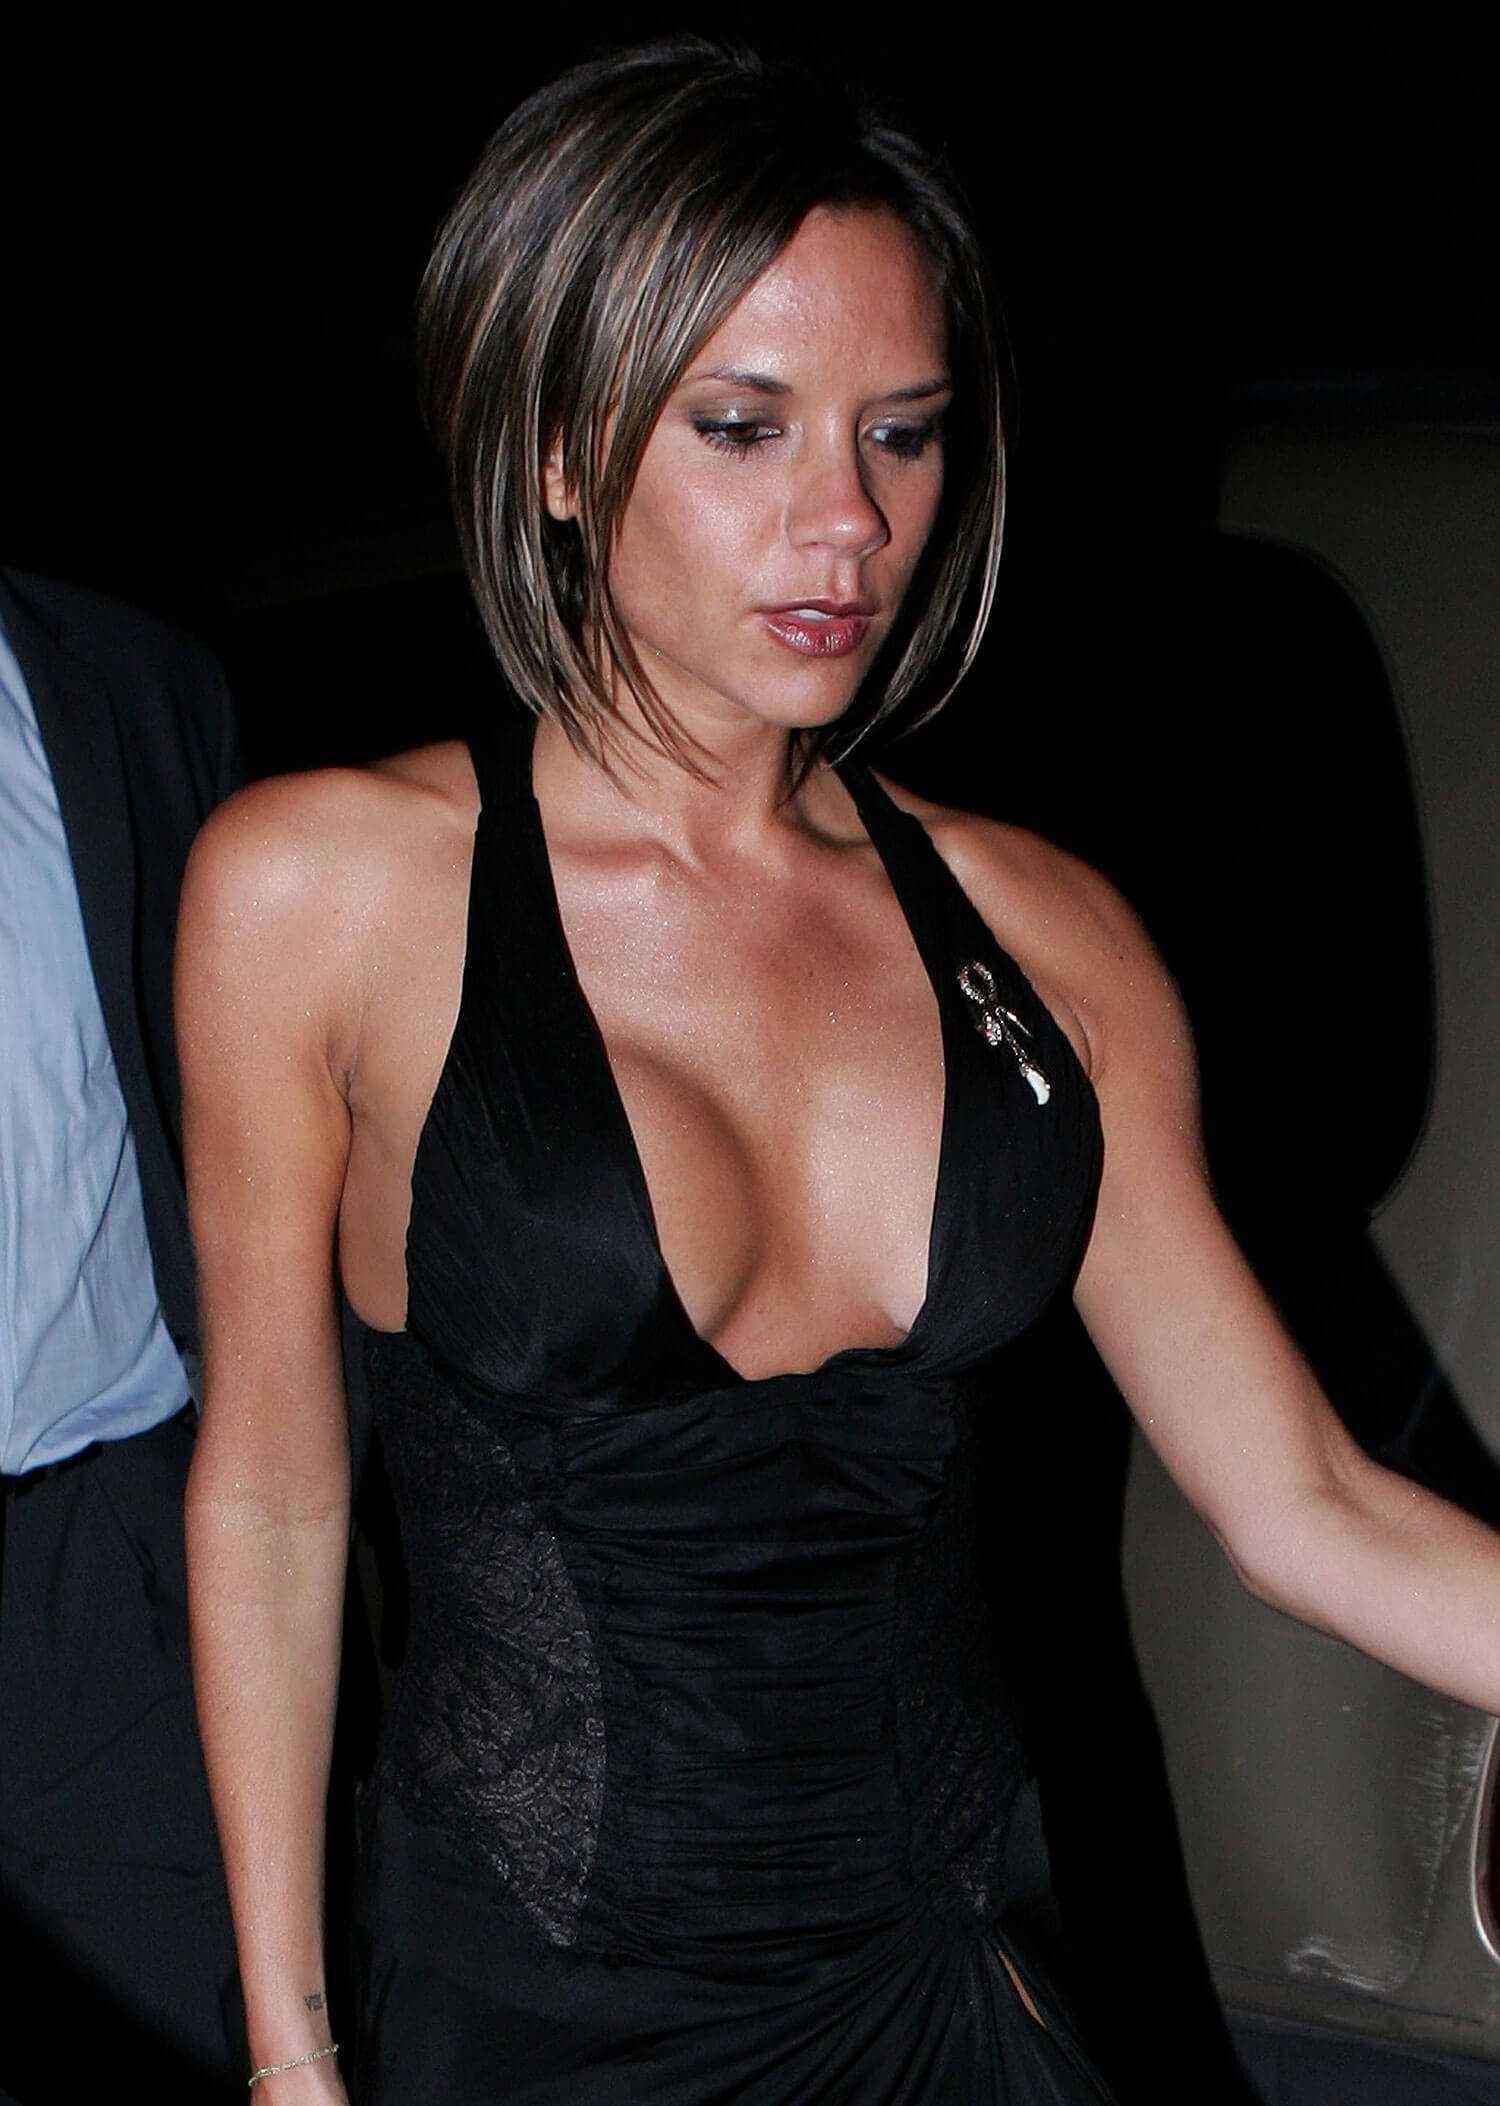 Victoria Beckham boobs pic